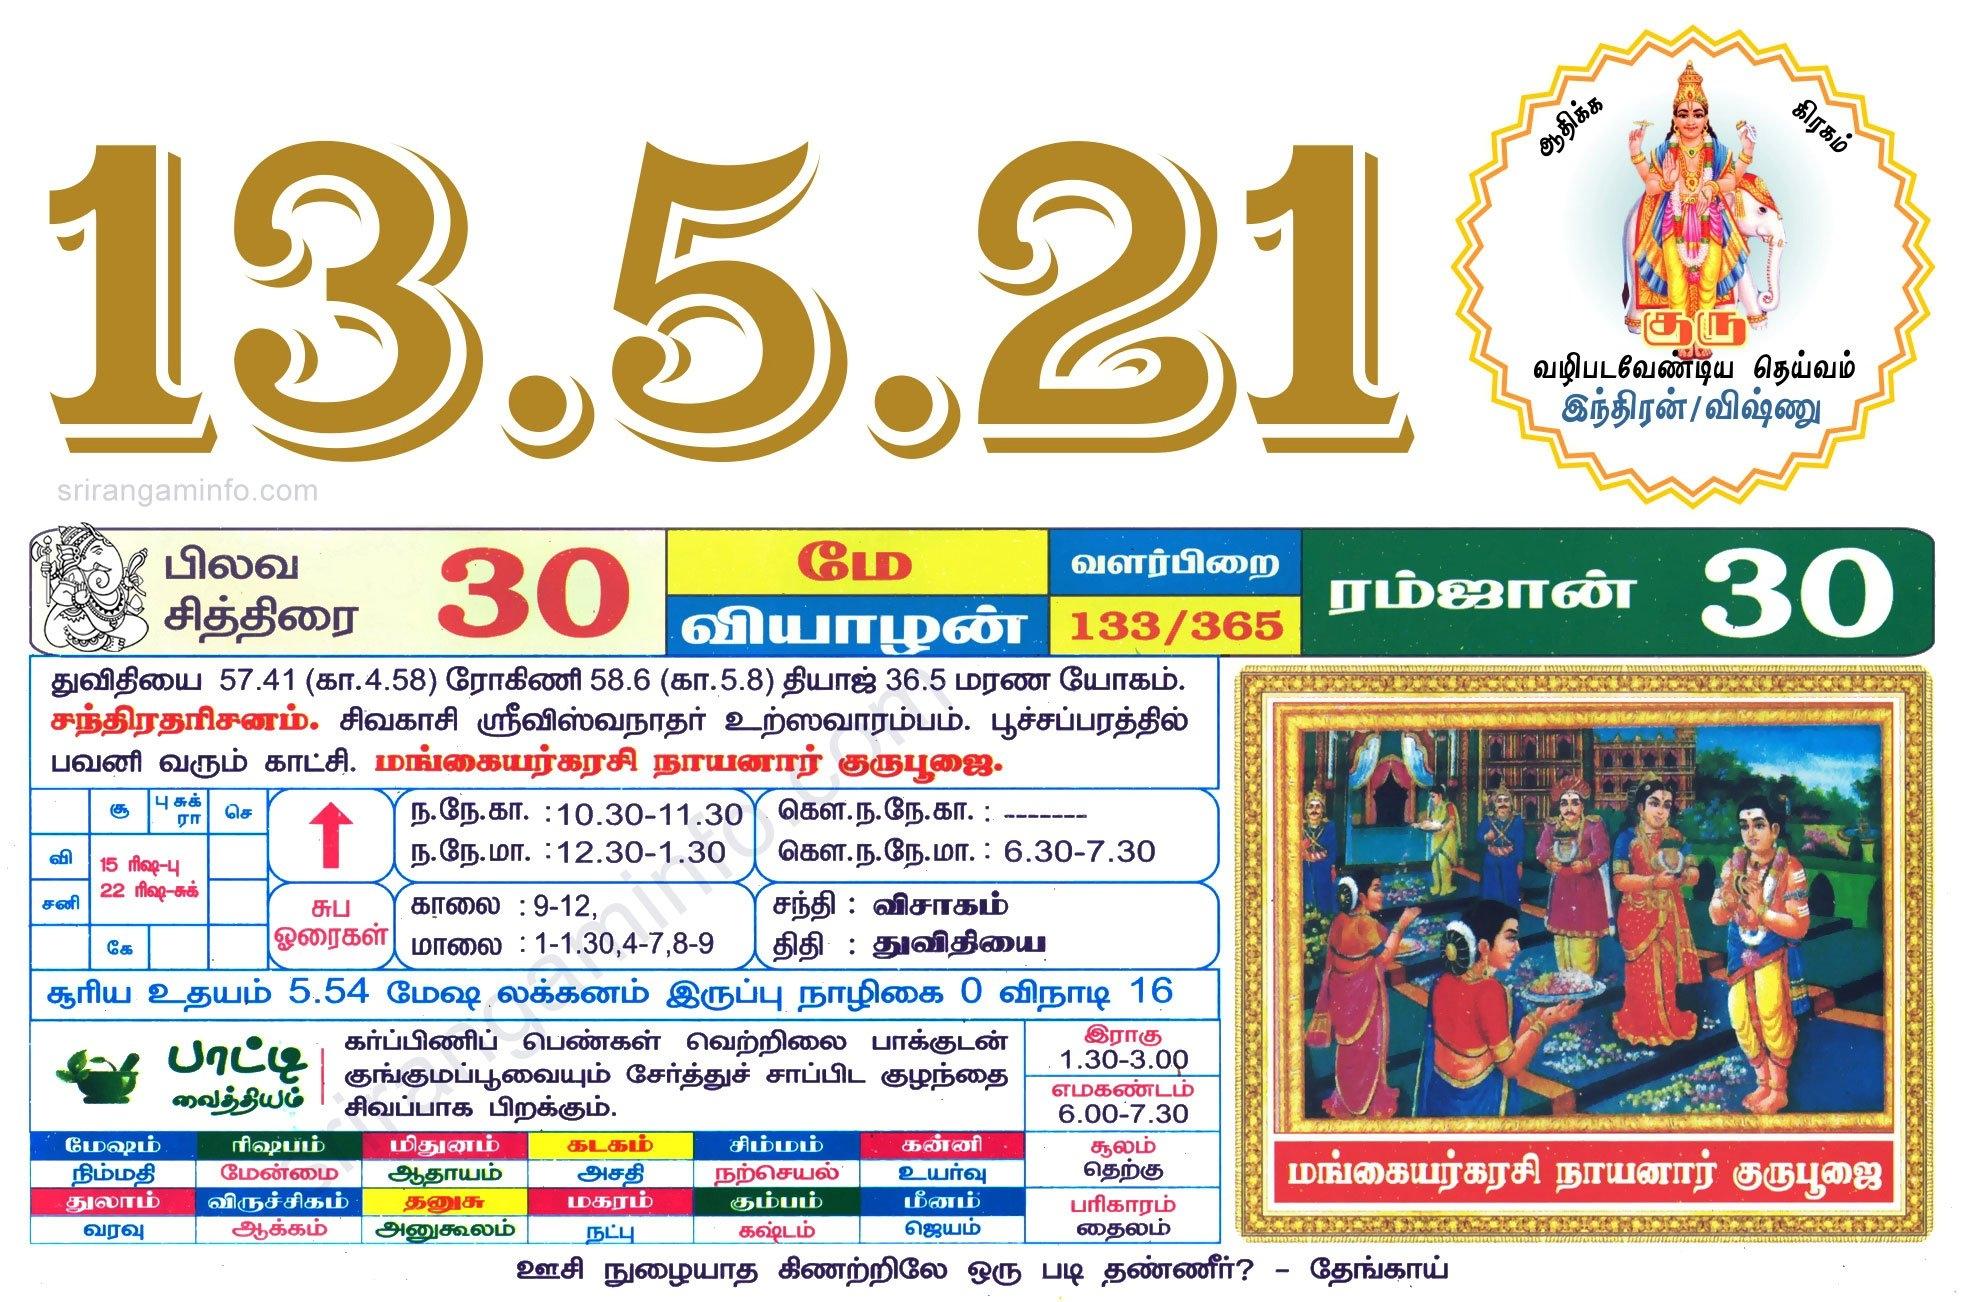 Tamil Daily Calendar 2021, Tamil Calendar 2021, Nalla Neram - தமிழ் தினசரி காலண்டர் intended for Calender Kuda In Tamil 2021